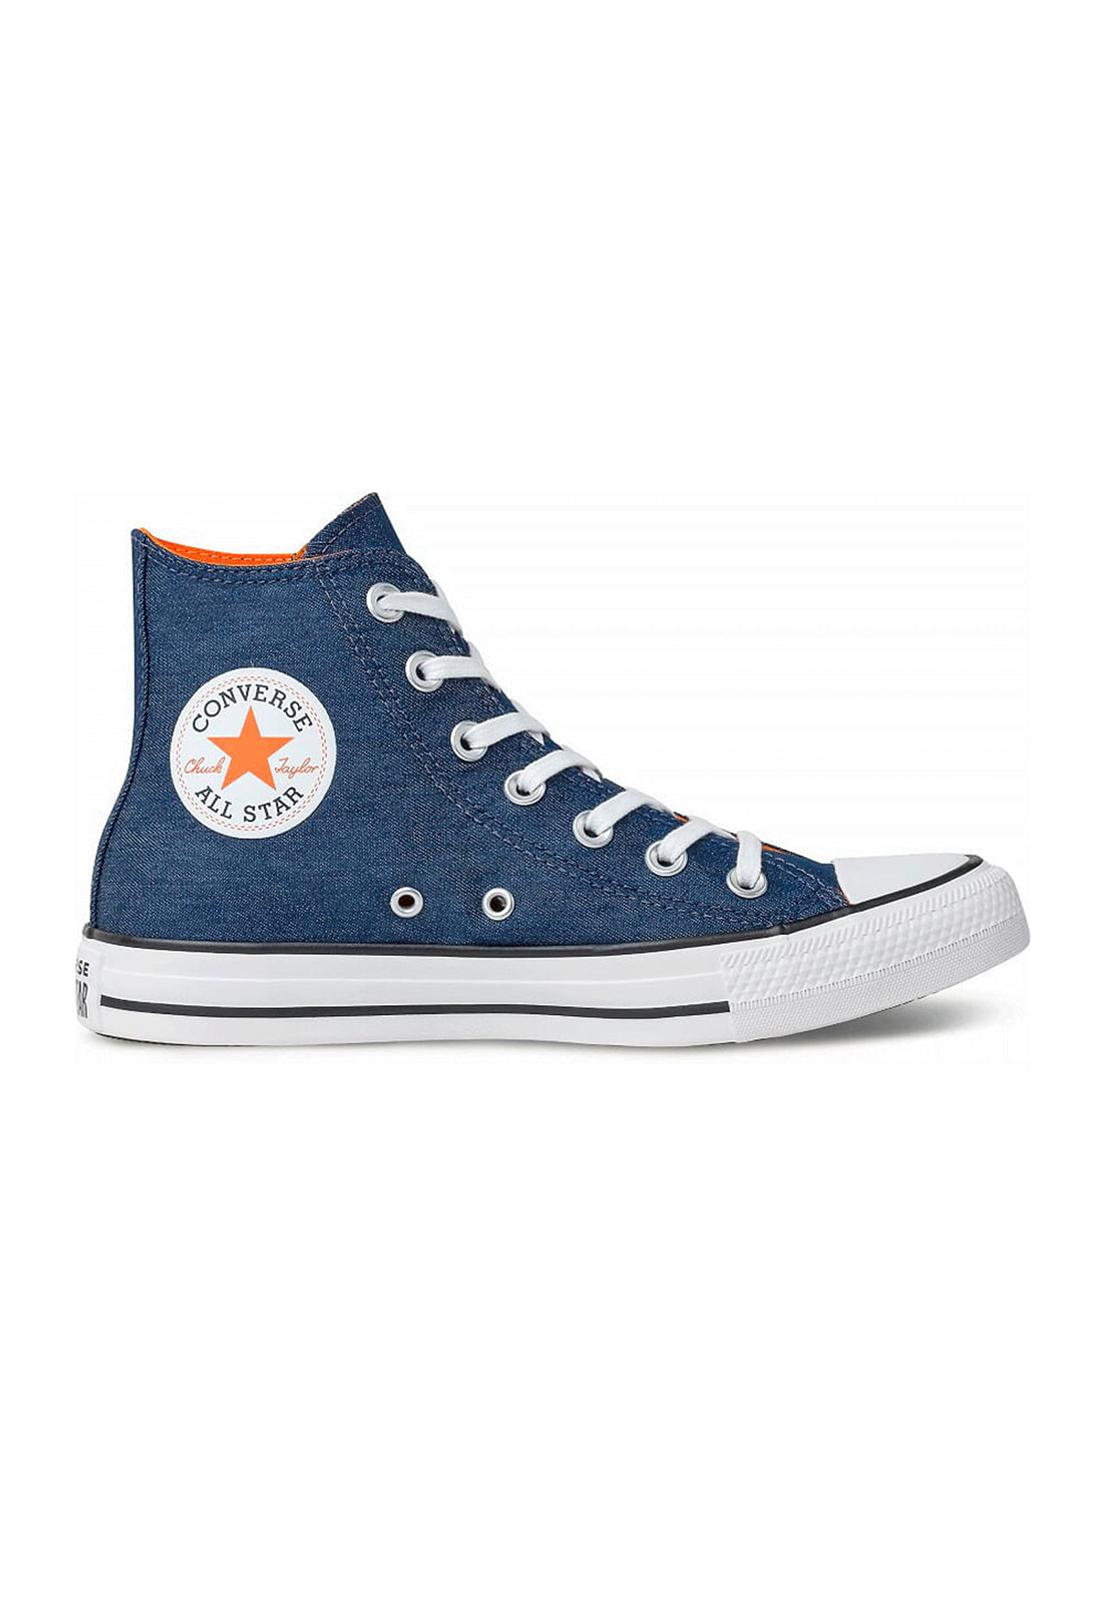 Tênis Converse Chuck Taylor All Star Hi Jeans Marinho Tangerina